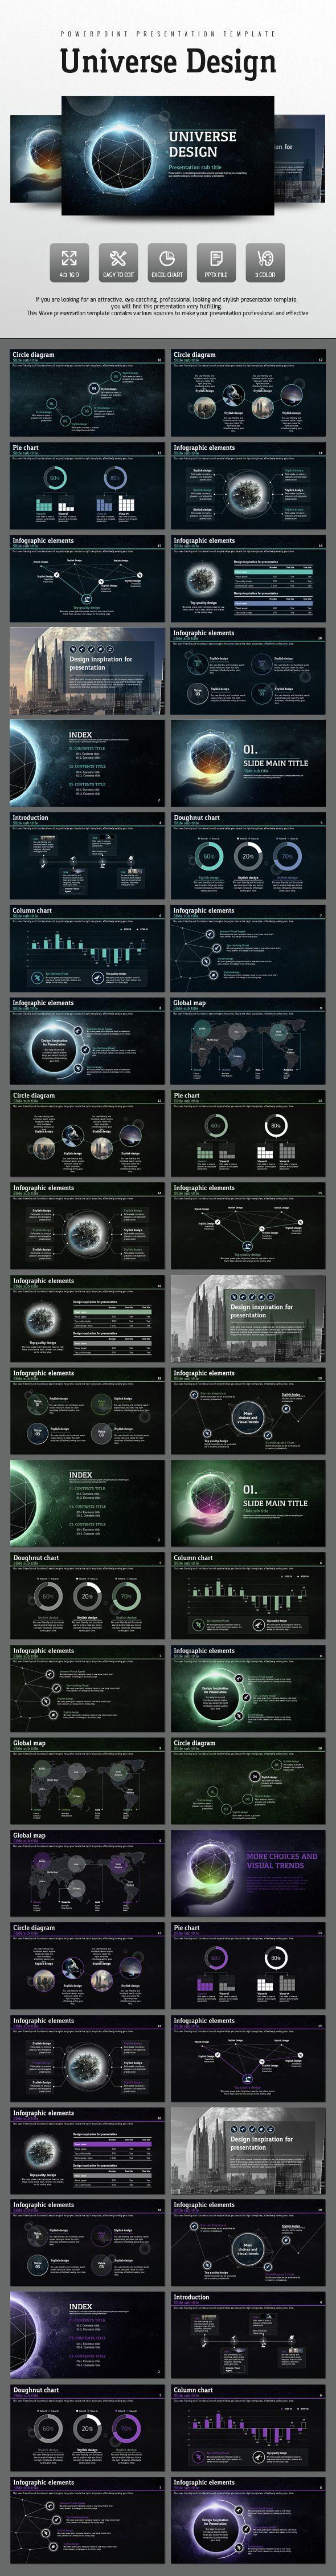 User Interface UI Design by the Urbanist Lab